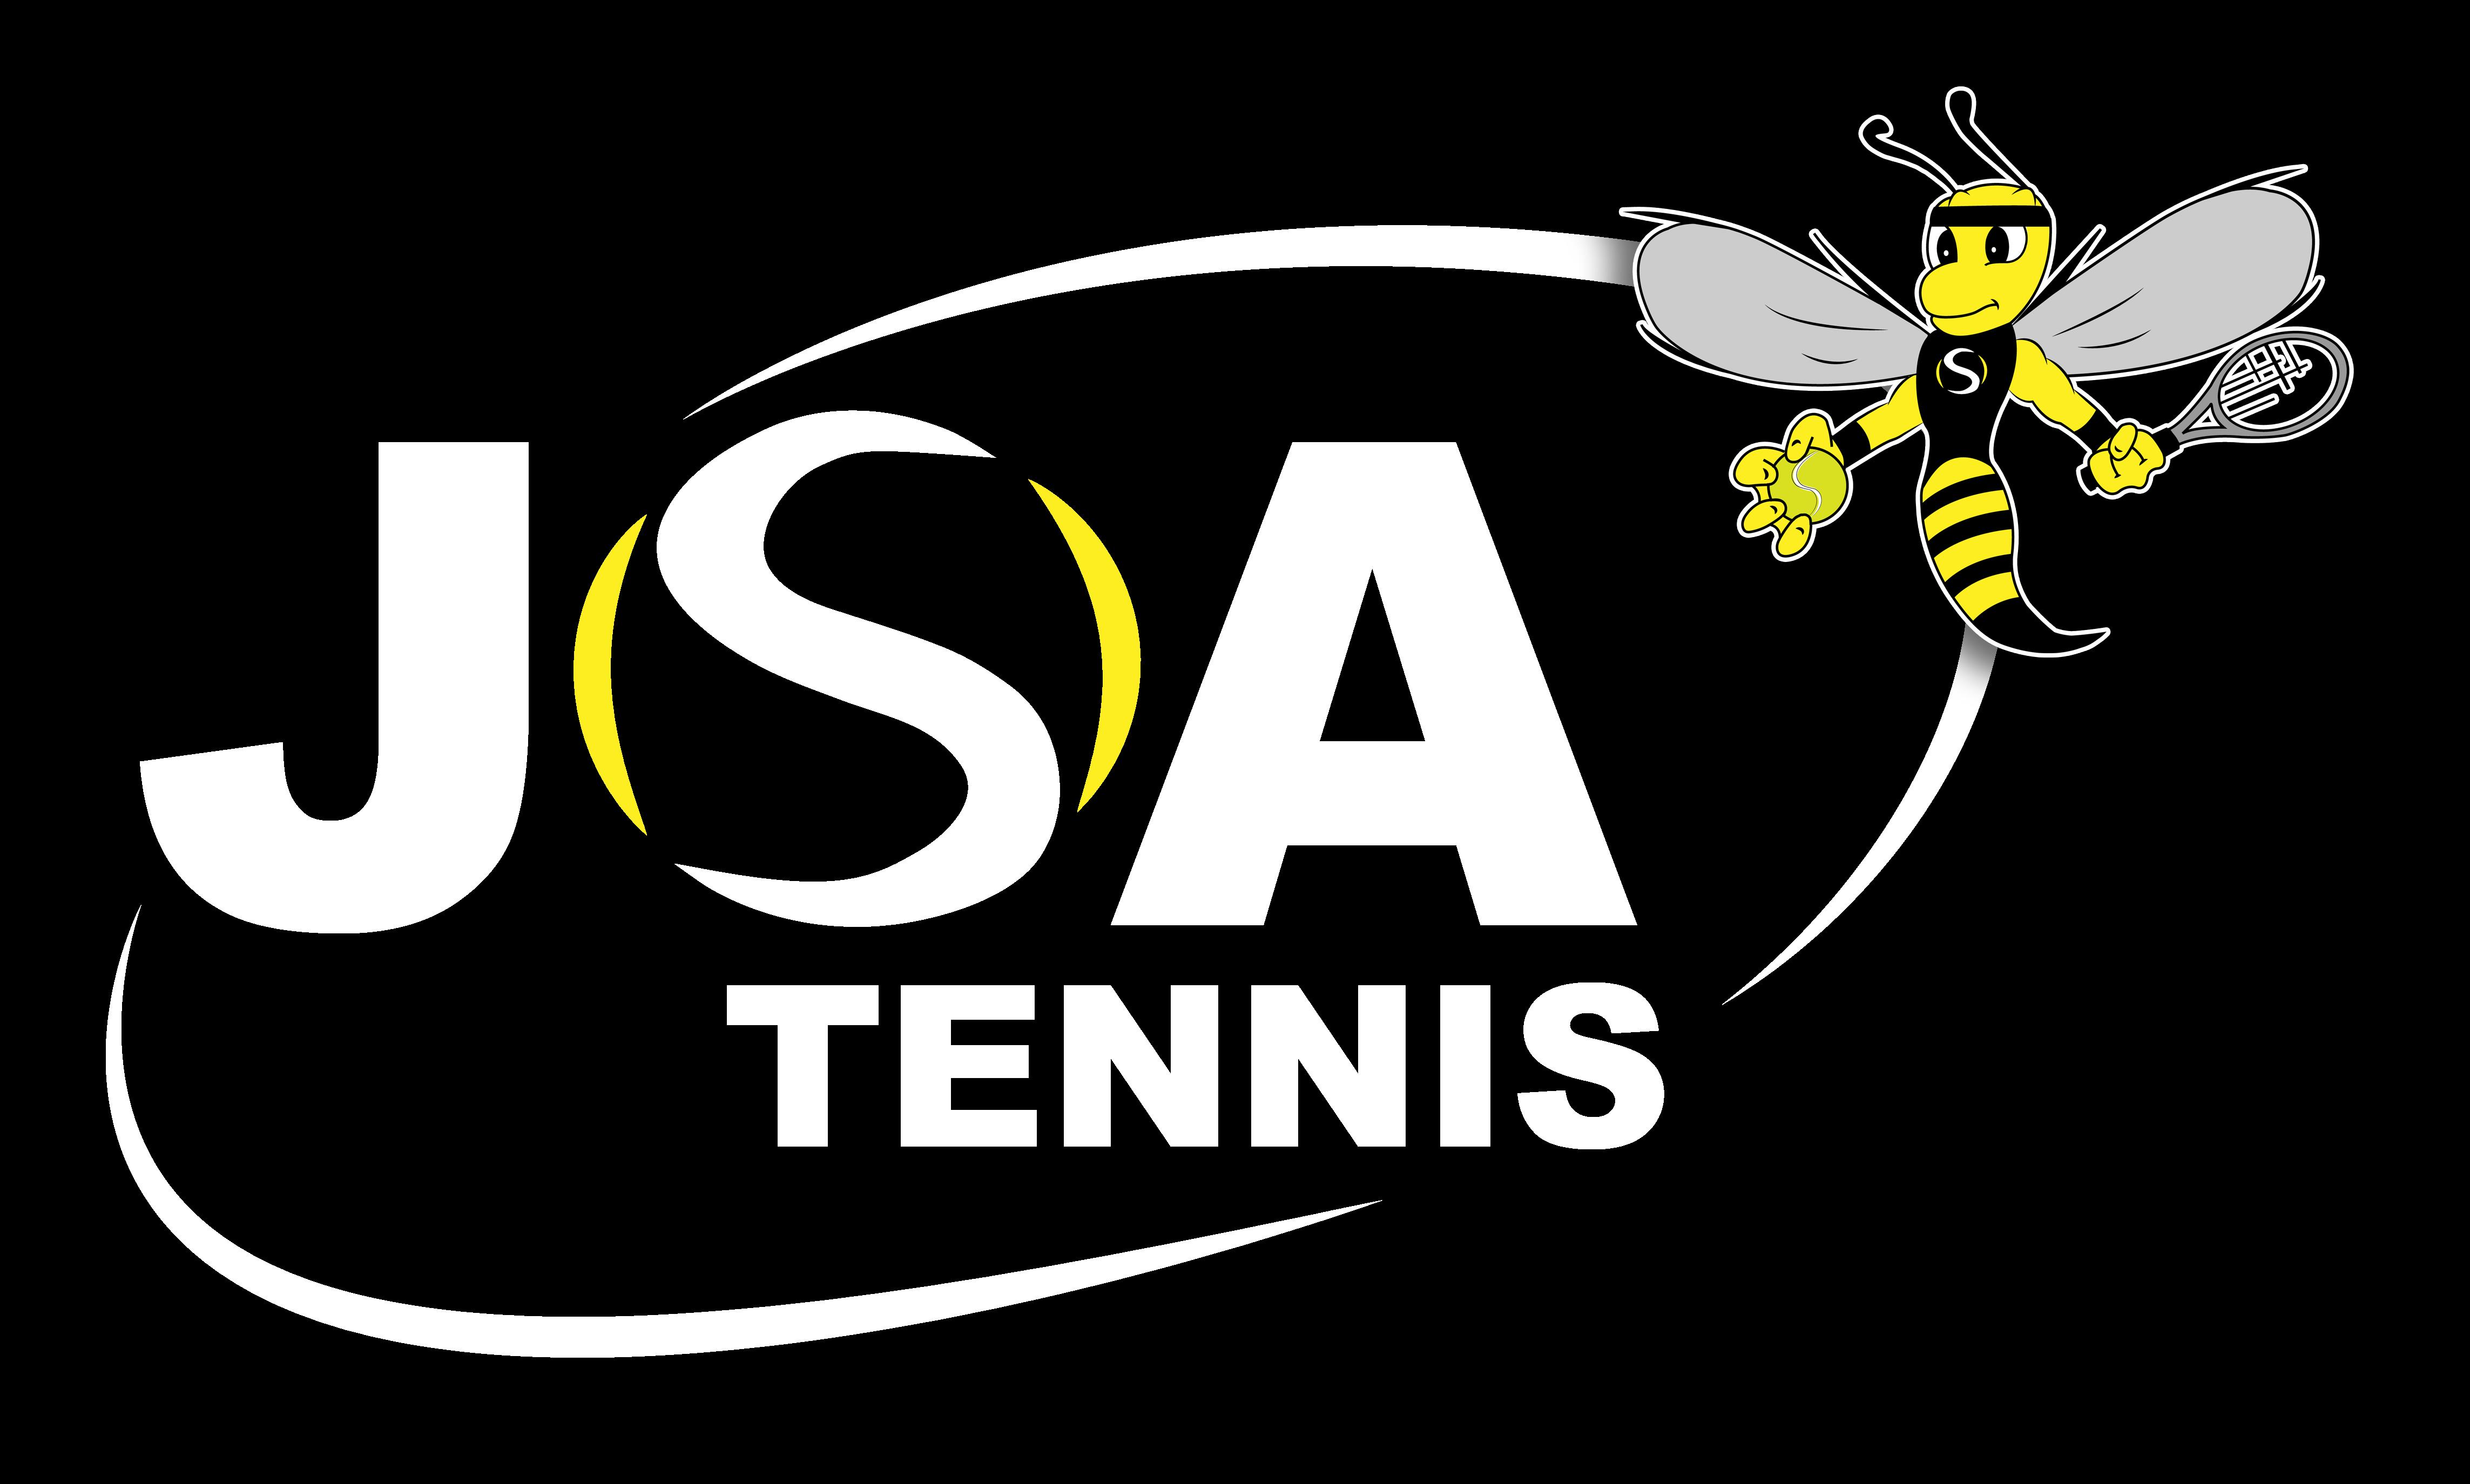 JSA Tennis